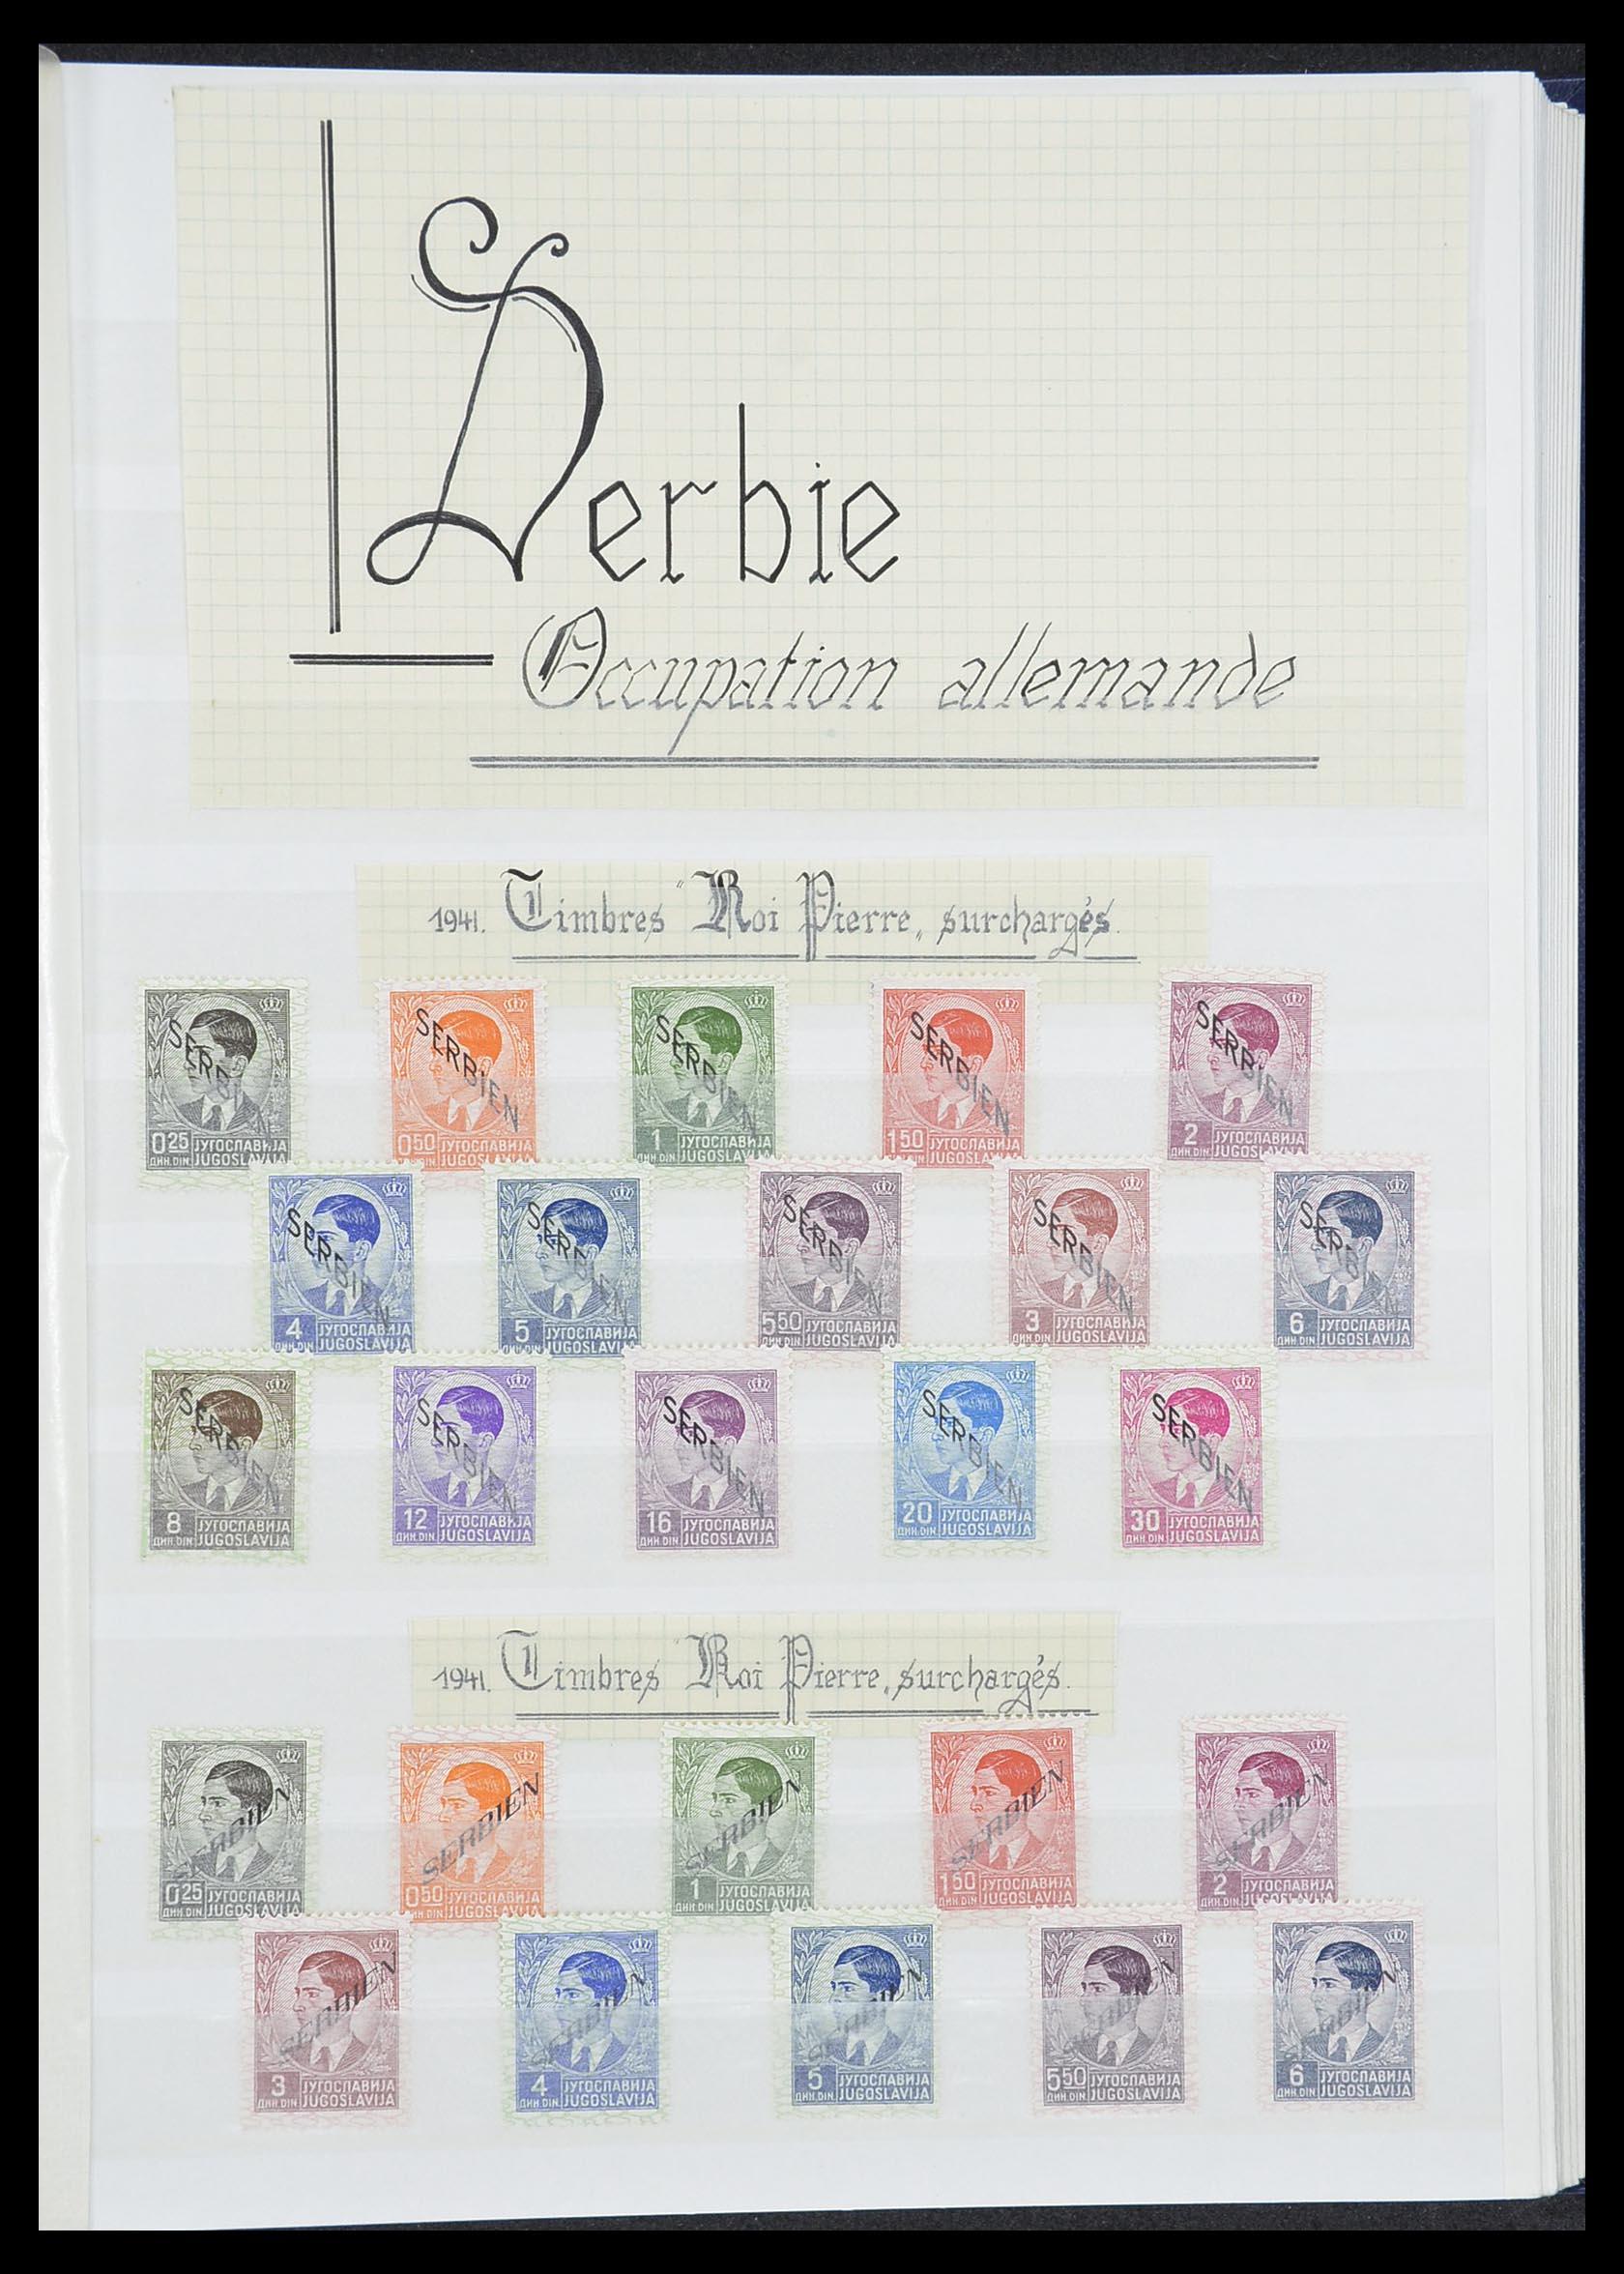 33850 013 - Postzegelverzameling 33850 Duitse bezettingen 2e wereldoorlog 1939-19